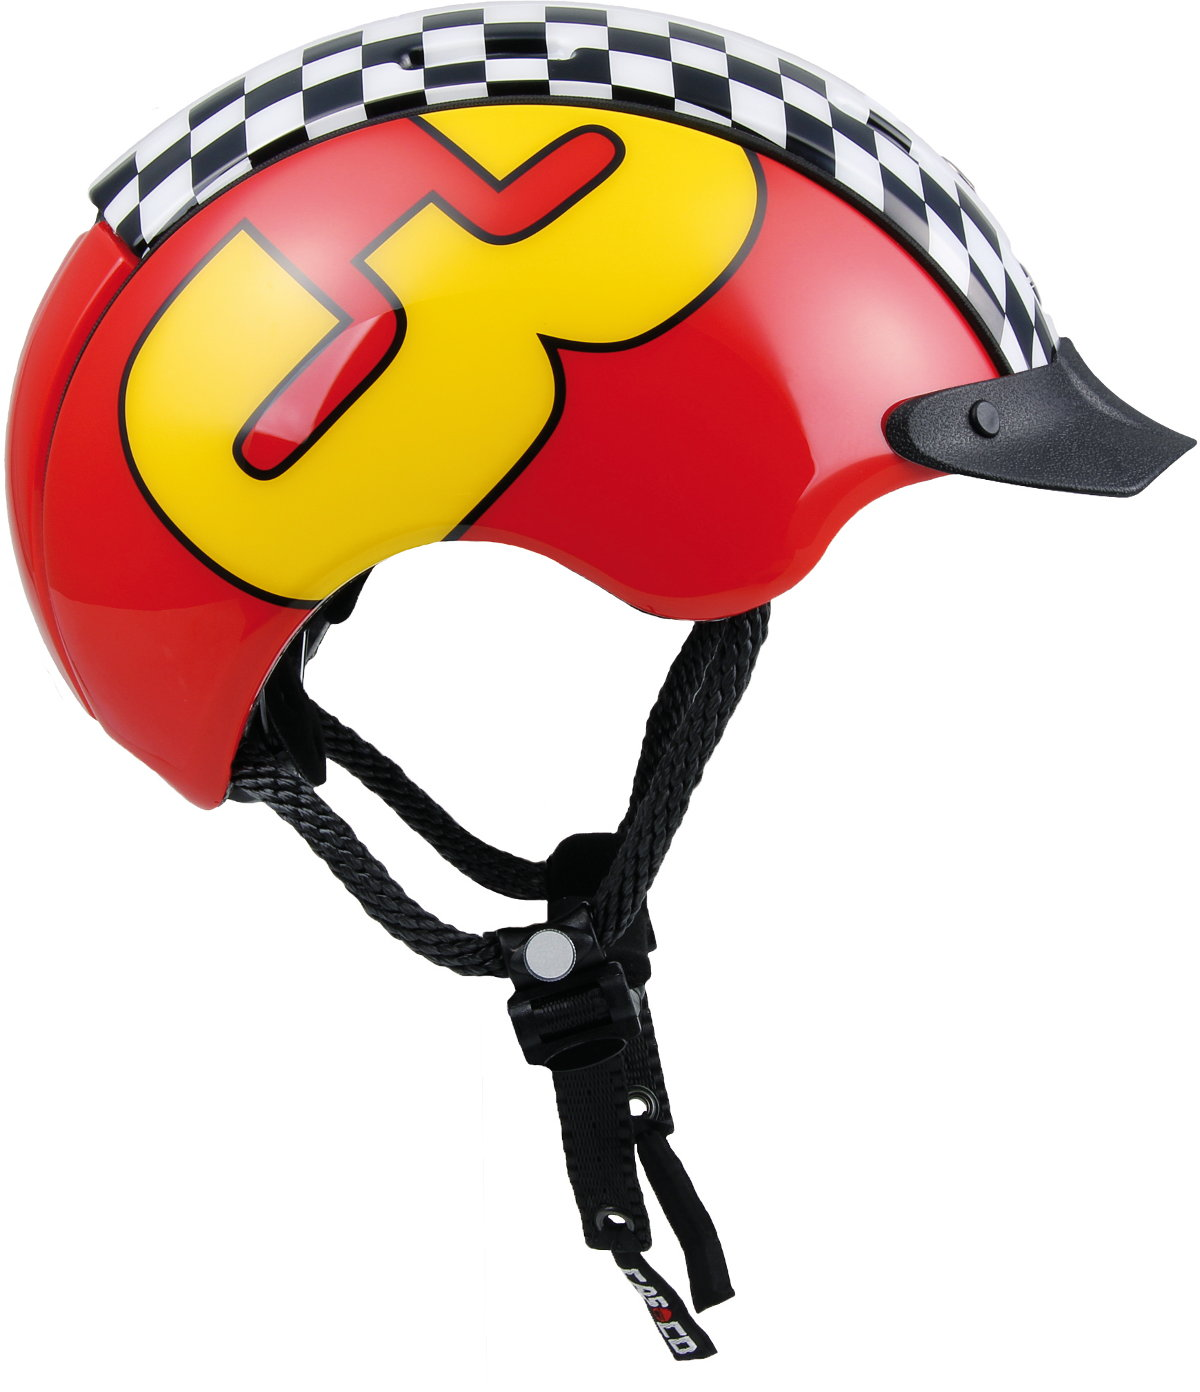 Casco_Mini_Generation_Racer_side_2352